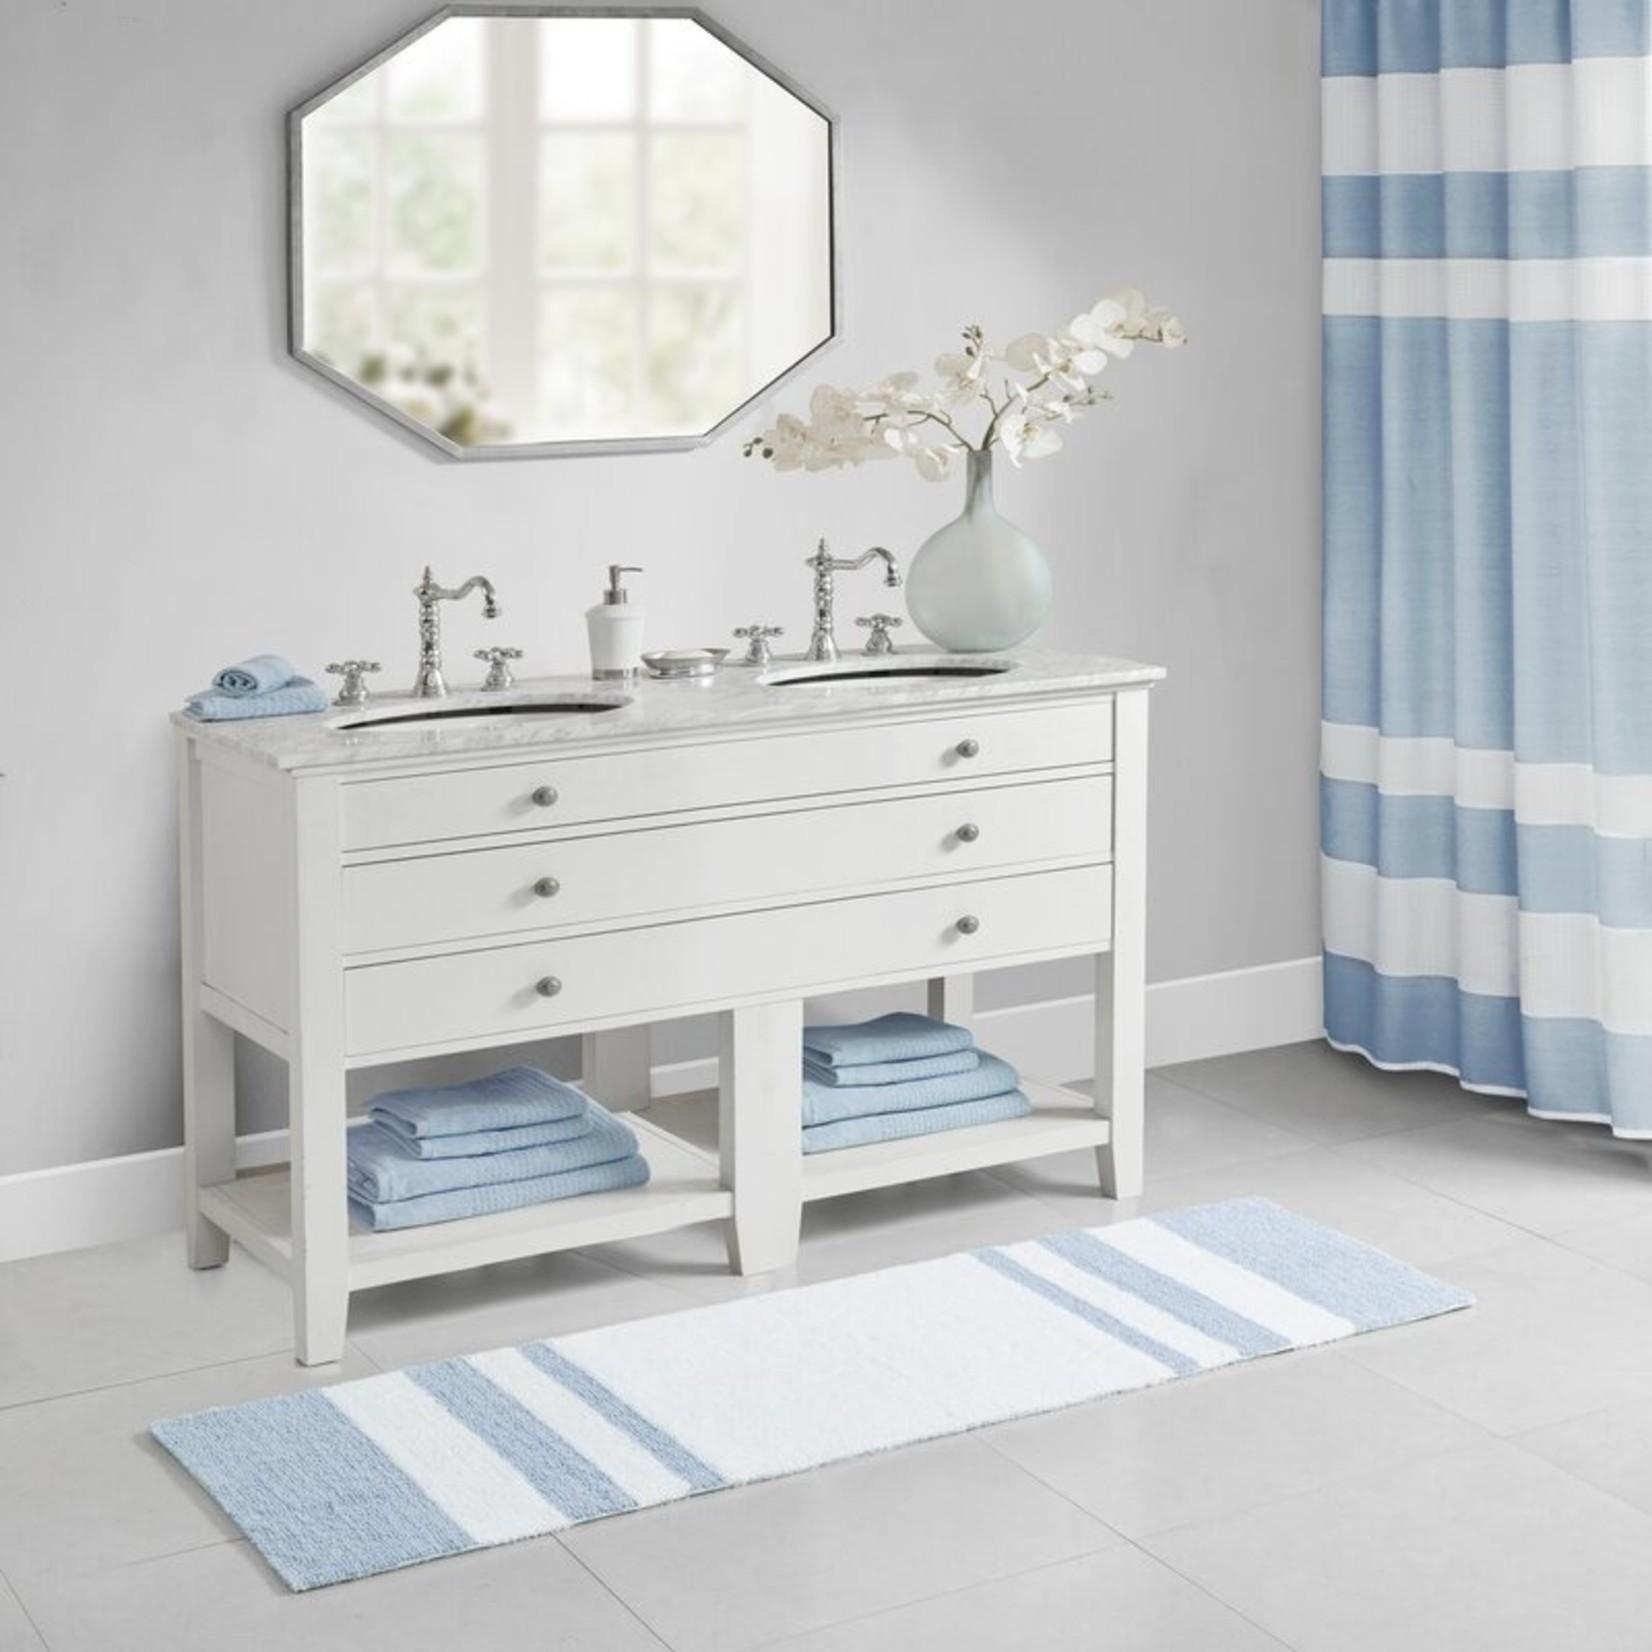 "*24"" x 72"" - Rosenbloom Rectangular 100% Cotton Striped Bath Rug"